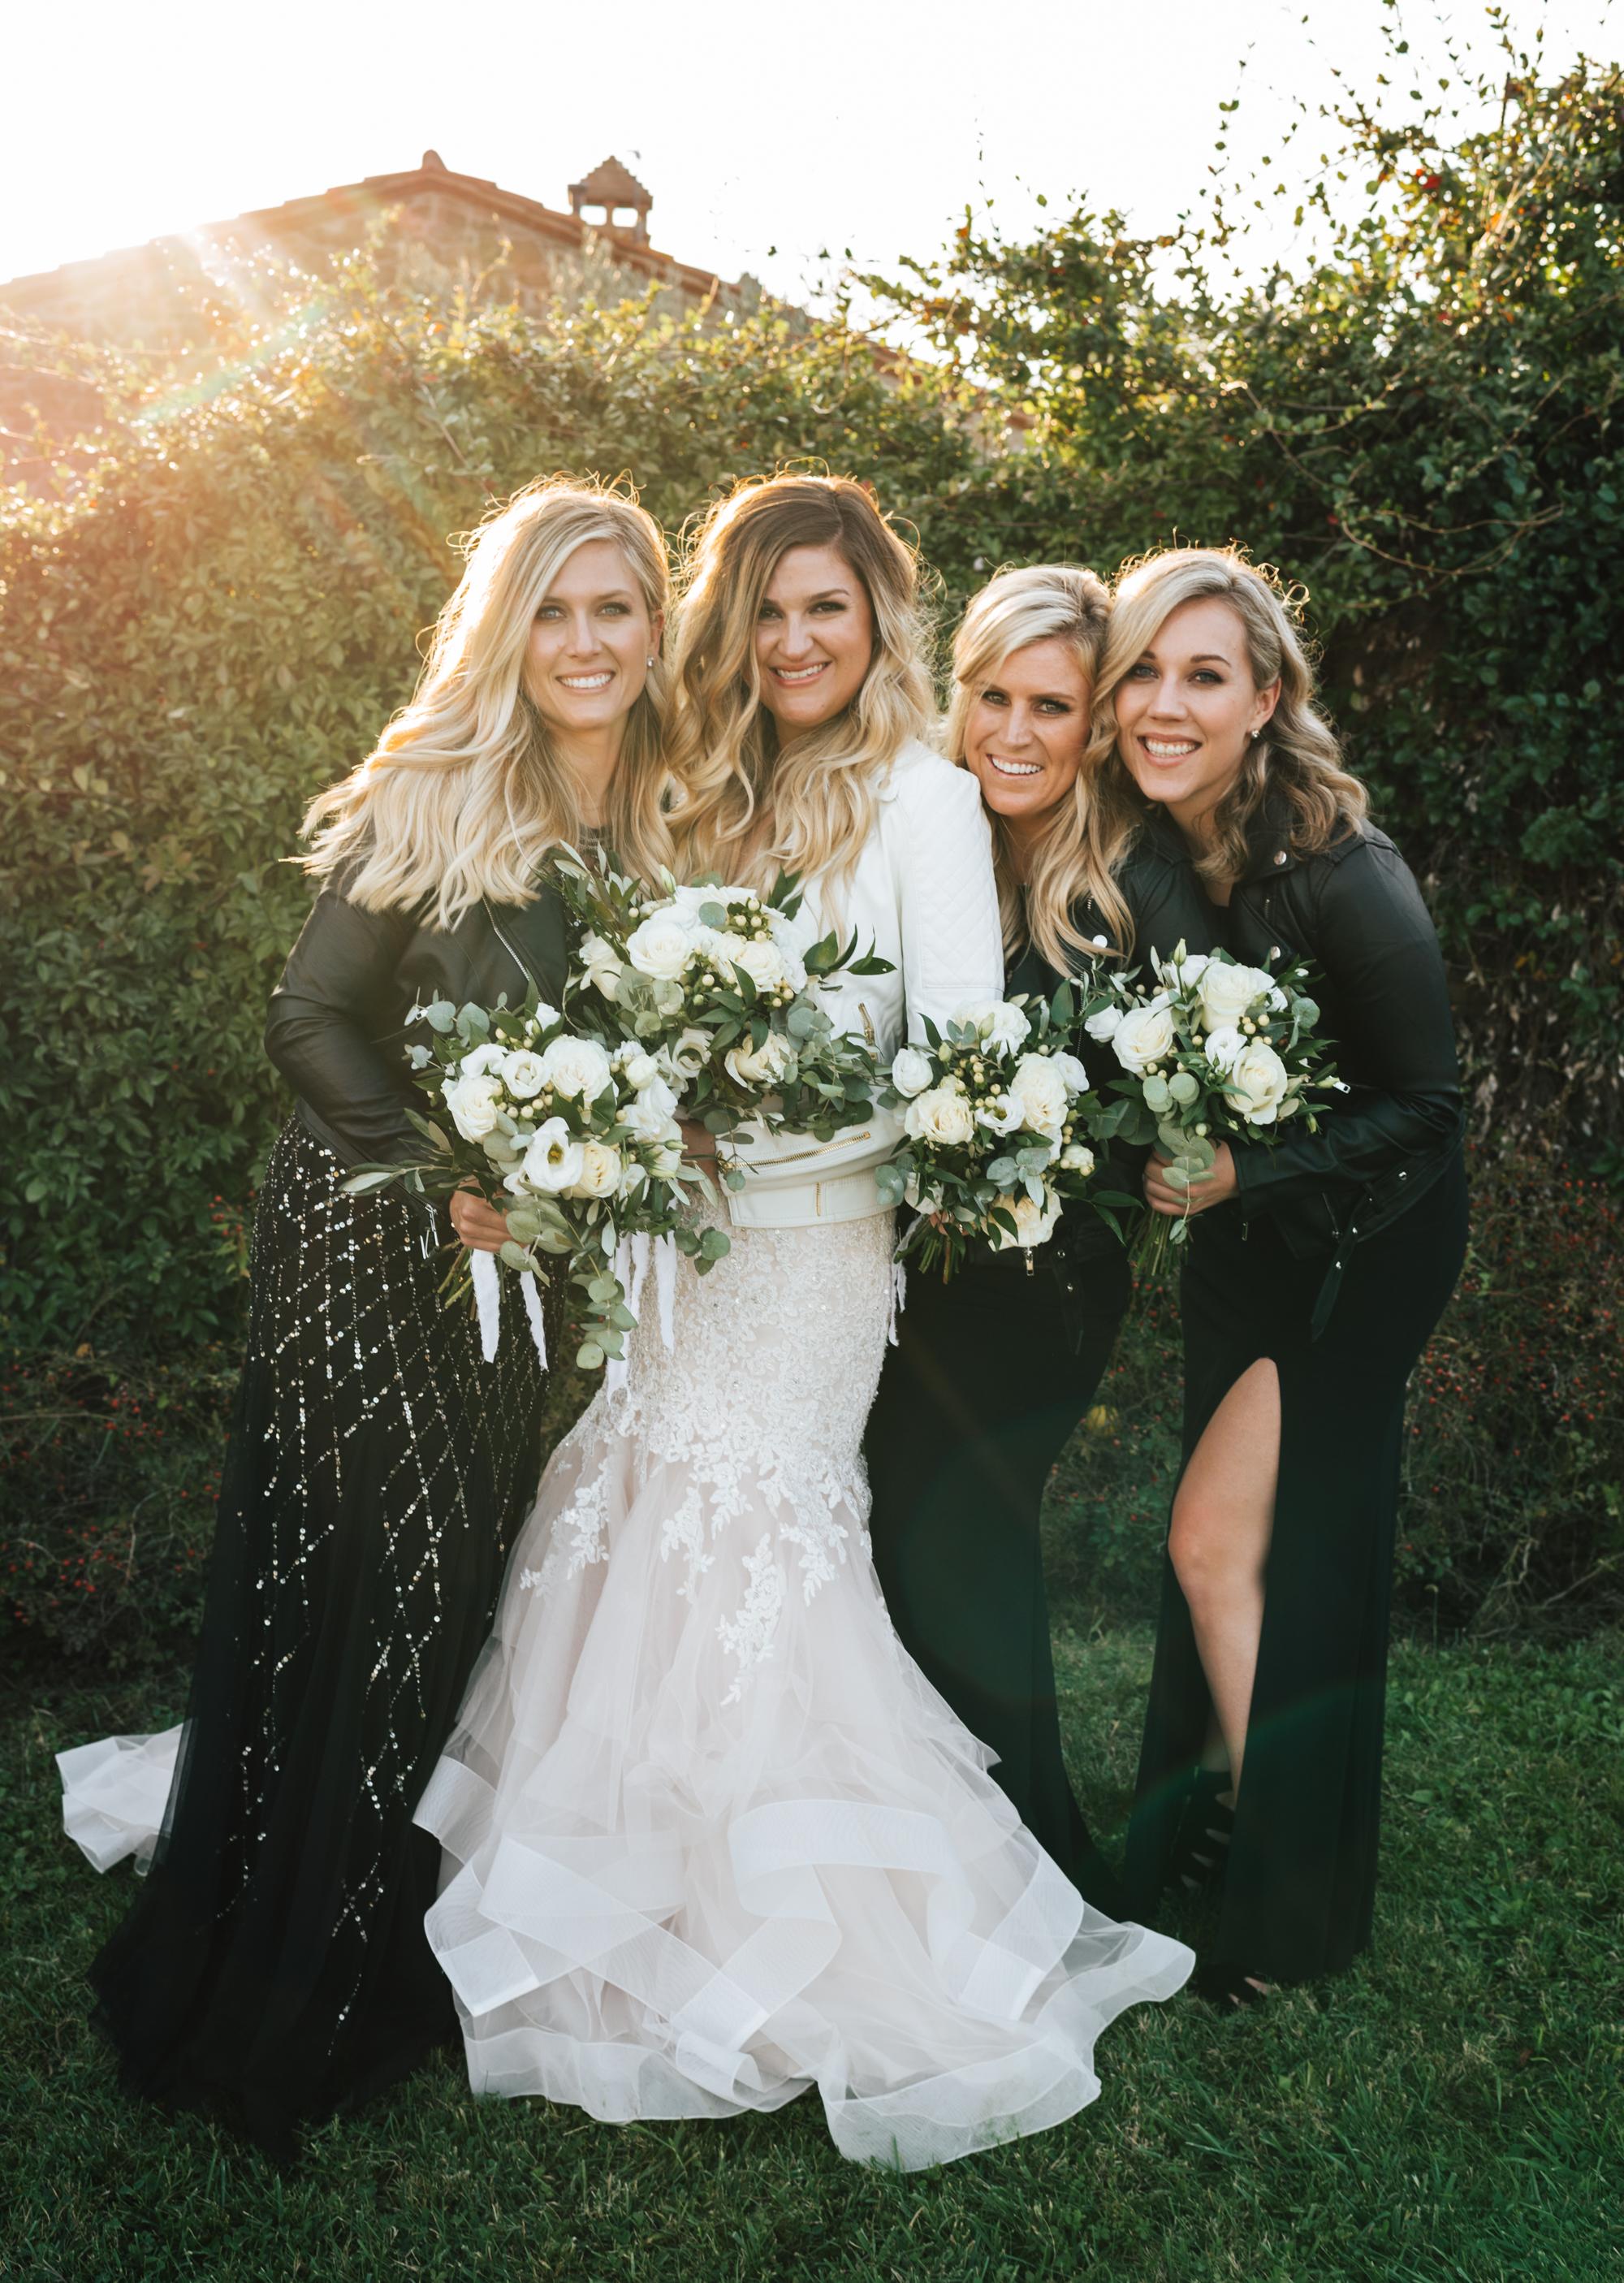 SamErica Studios - Cortona Italy Wedding -  Modern Destination Wedding photographers - leather bridesmaids jackets - leather wedding jacket